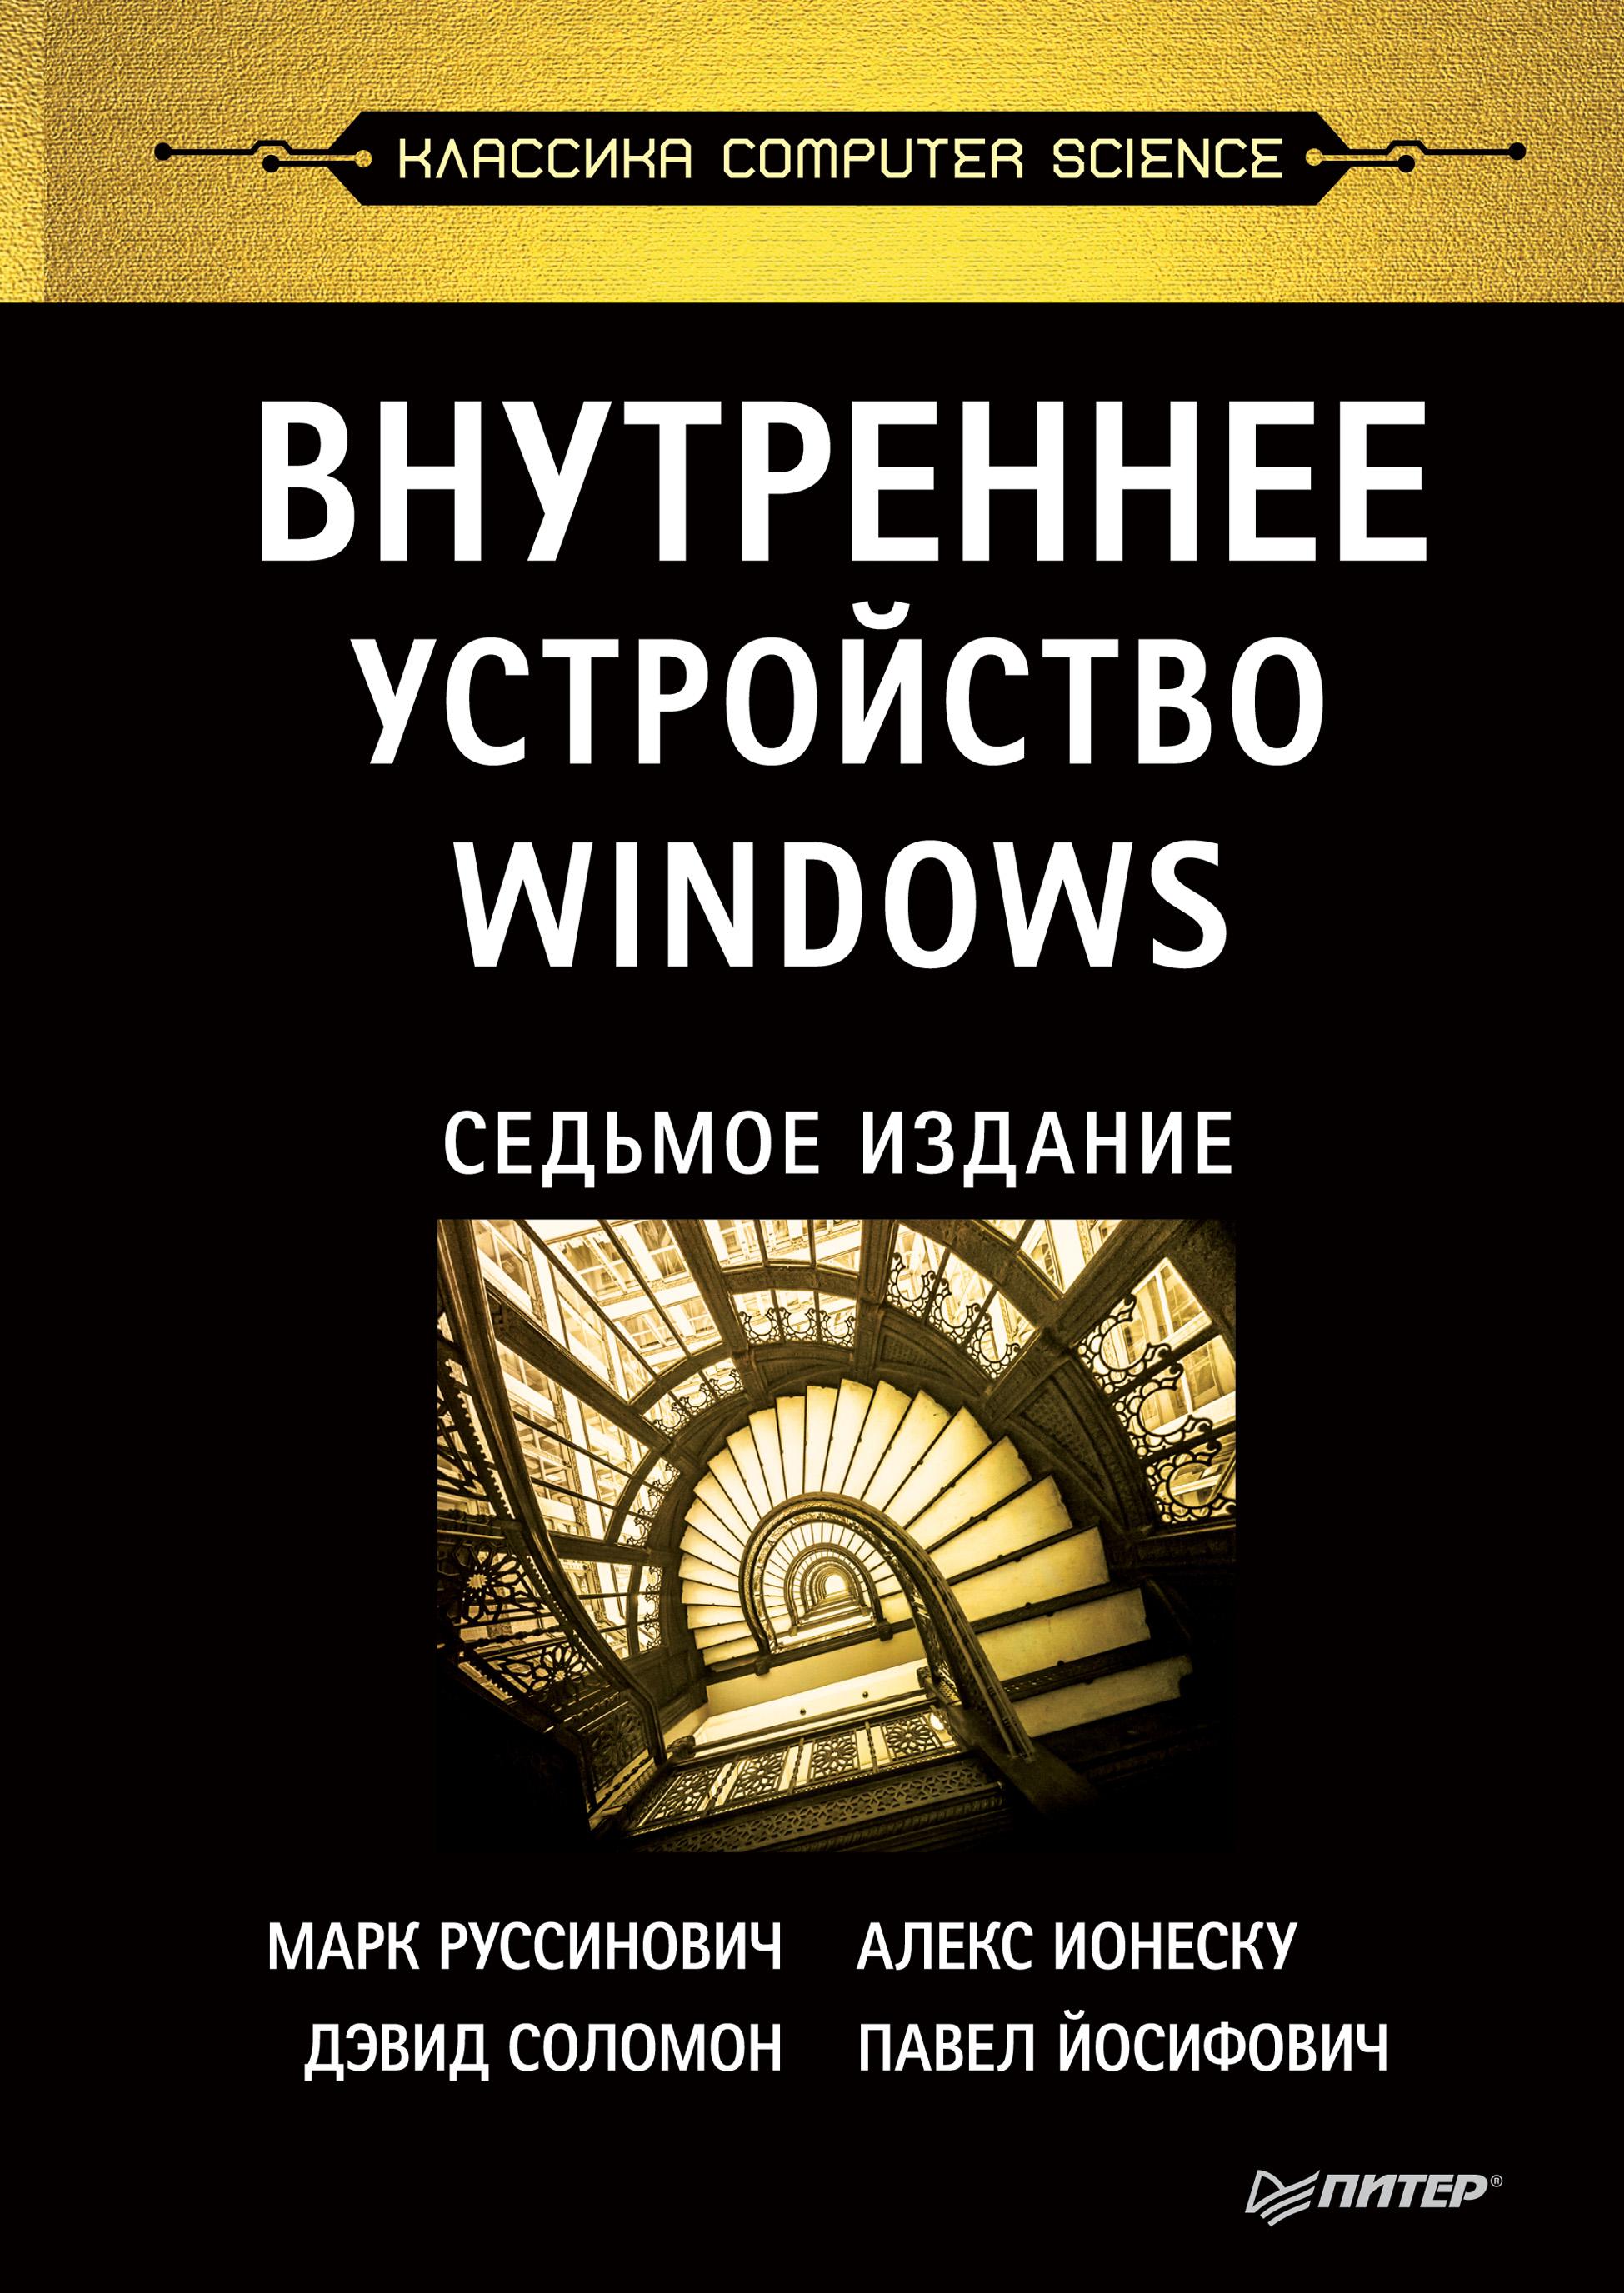 Марк Руссинович Внутреннее устройство Windows внутреннее устройство windows